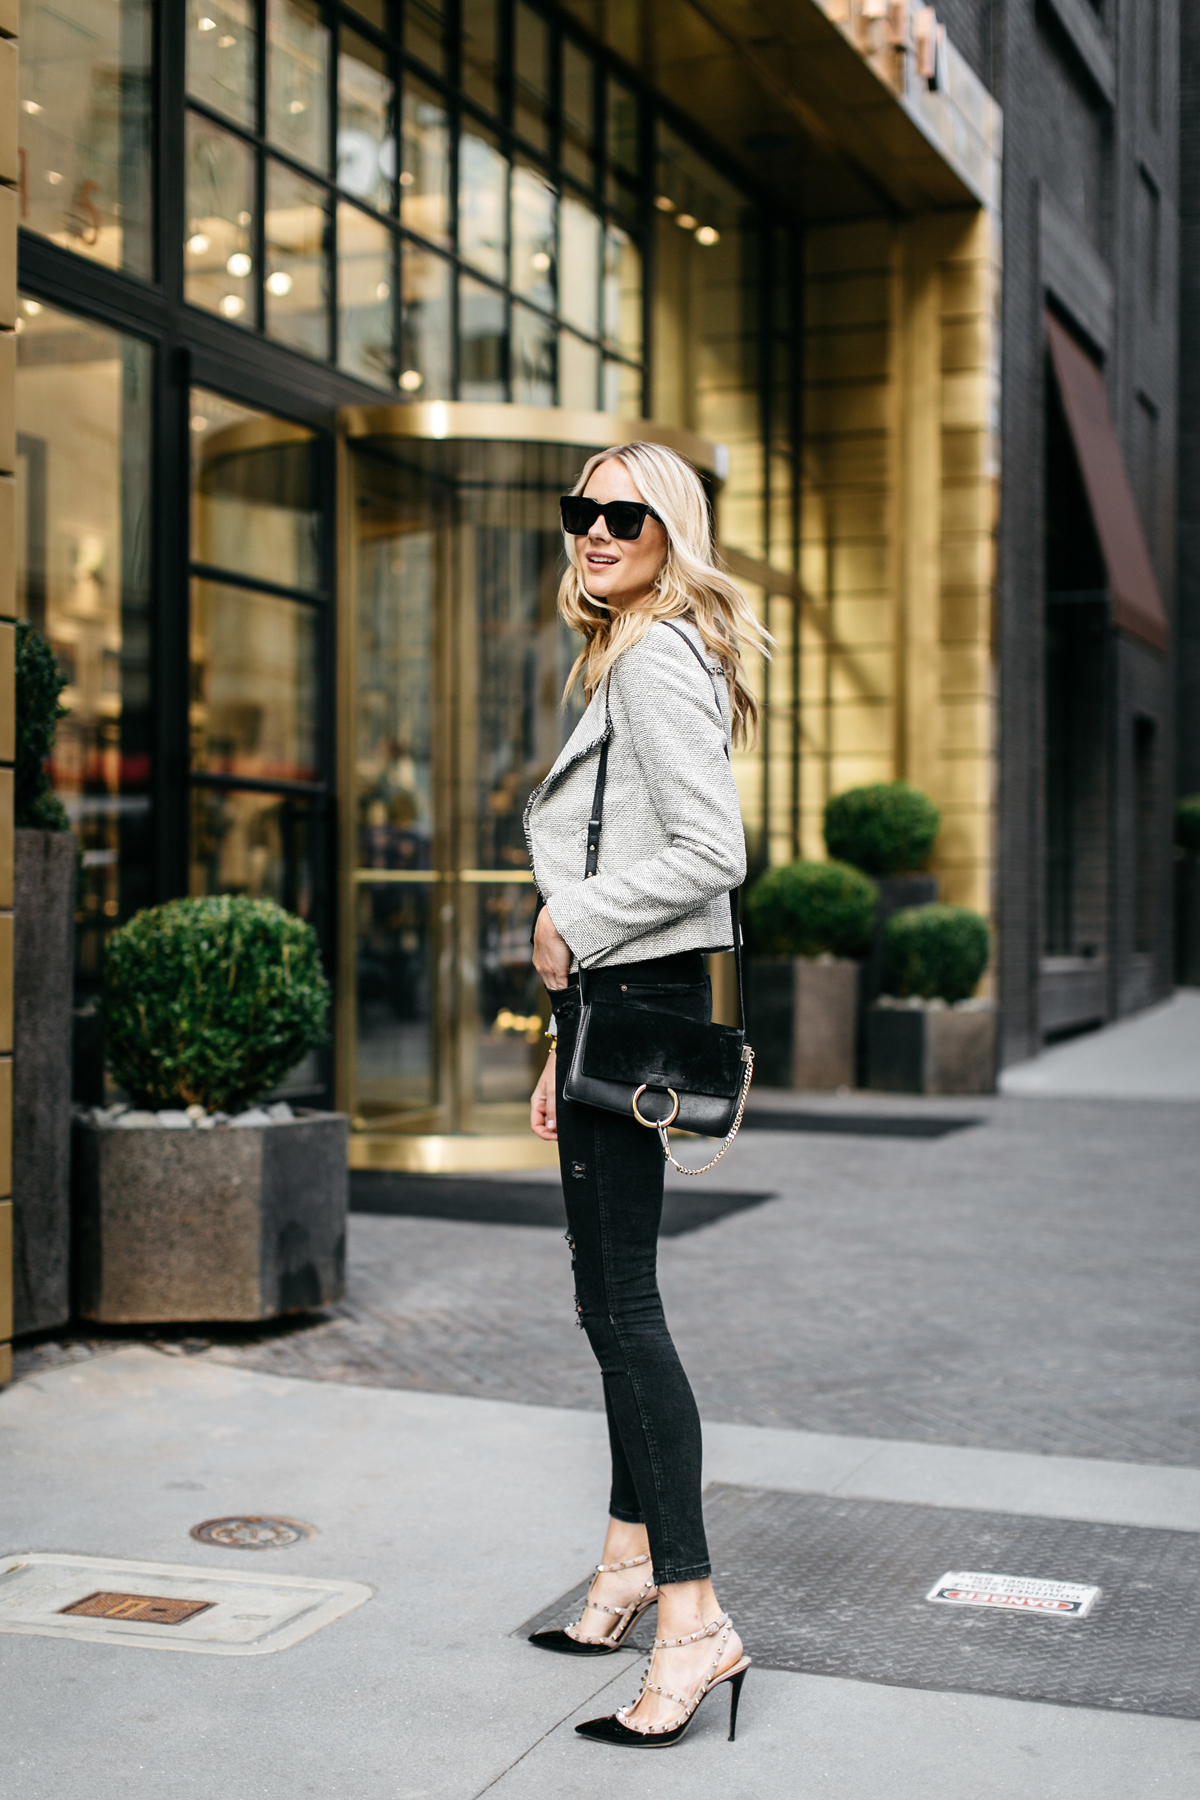 Fashion Jackson, Fringe Tweed Jacket, Black Lace Cami, Black Ripped Skinny Jeans, Valentino Rockstud Pumps, Chloe Faye Handbag